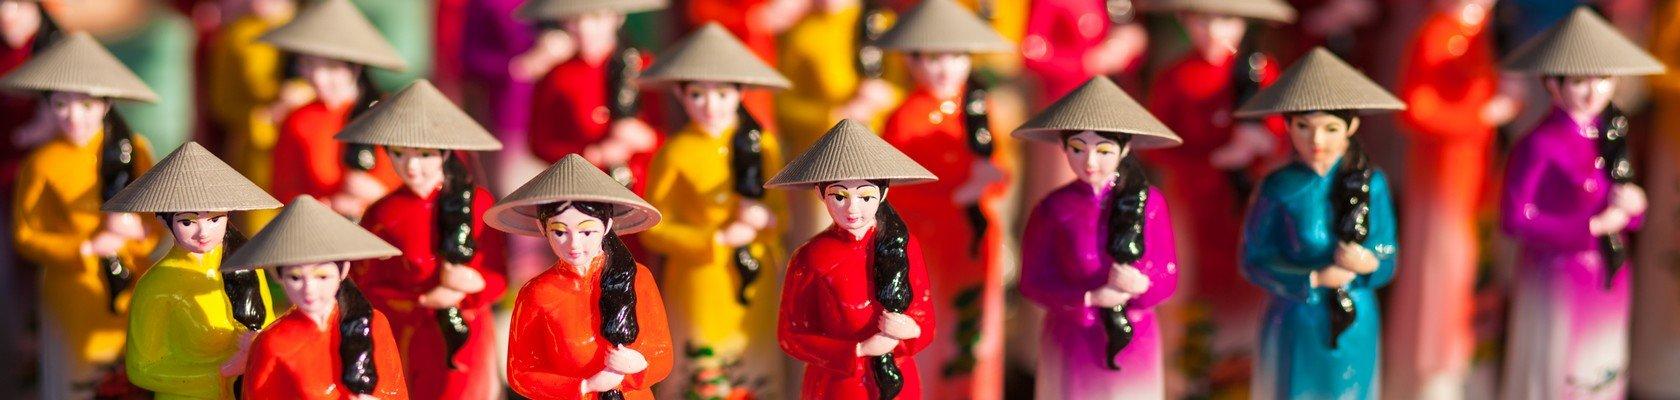 Koloniale binnenstad van Hanoi